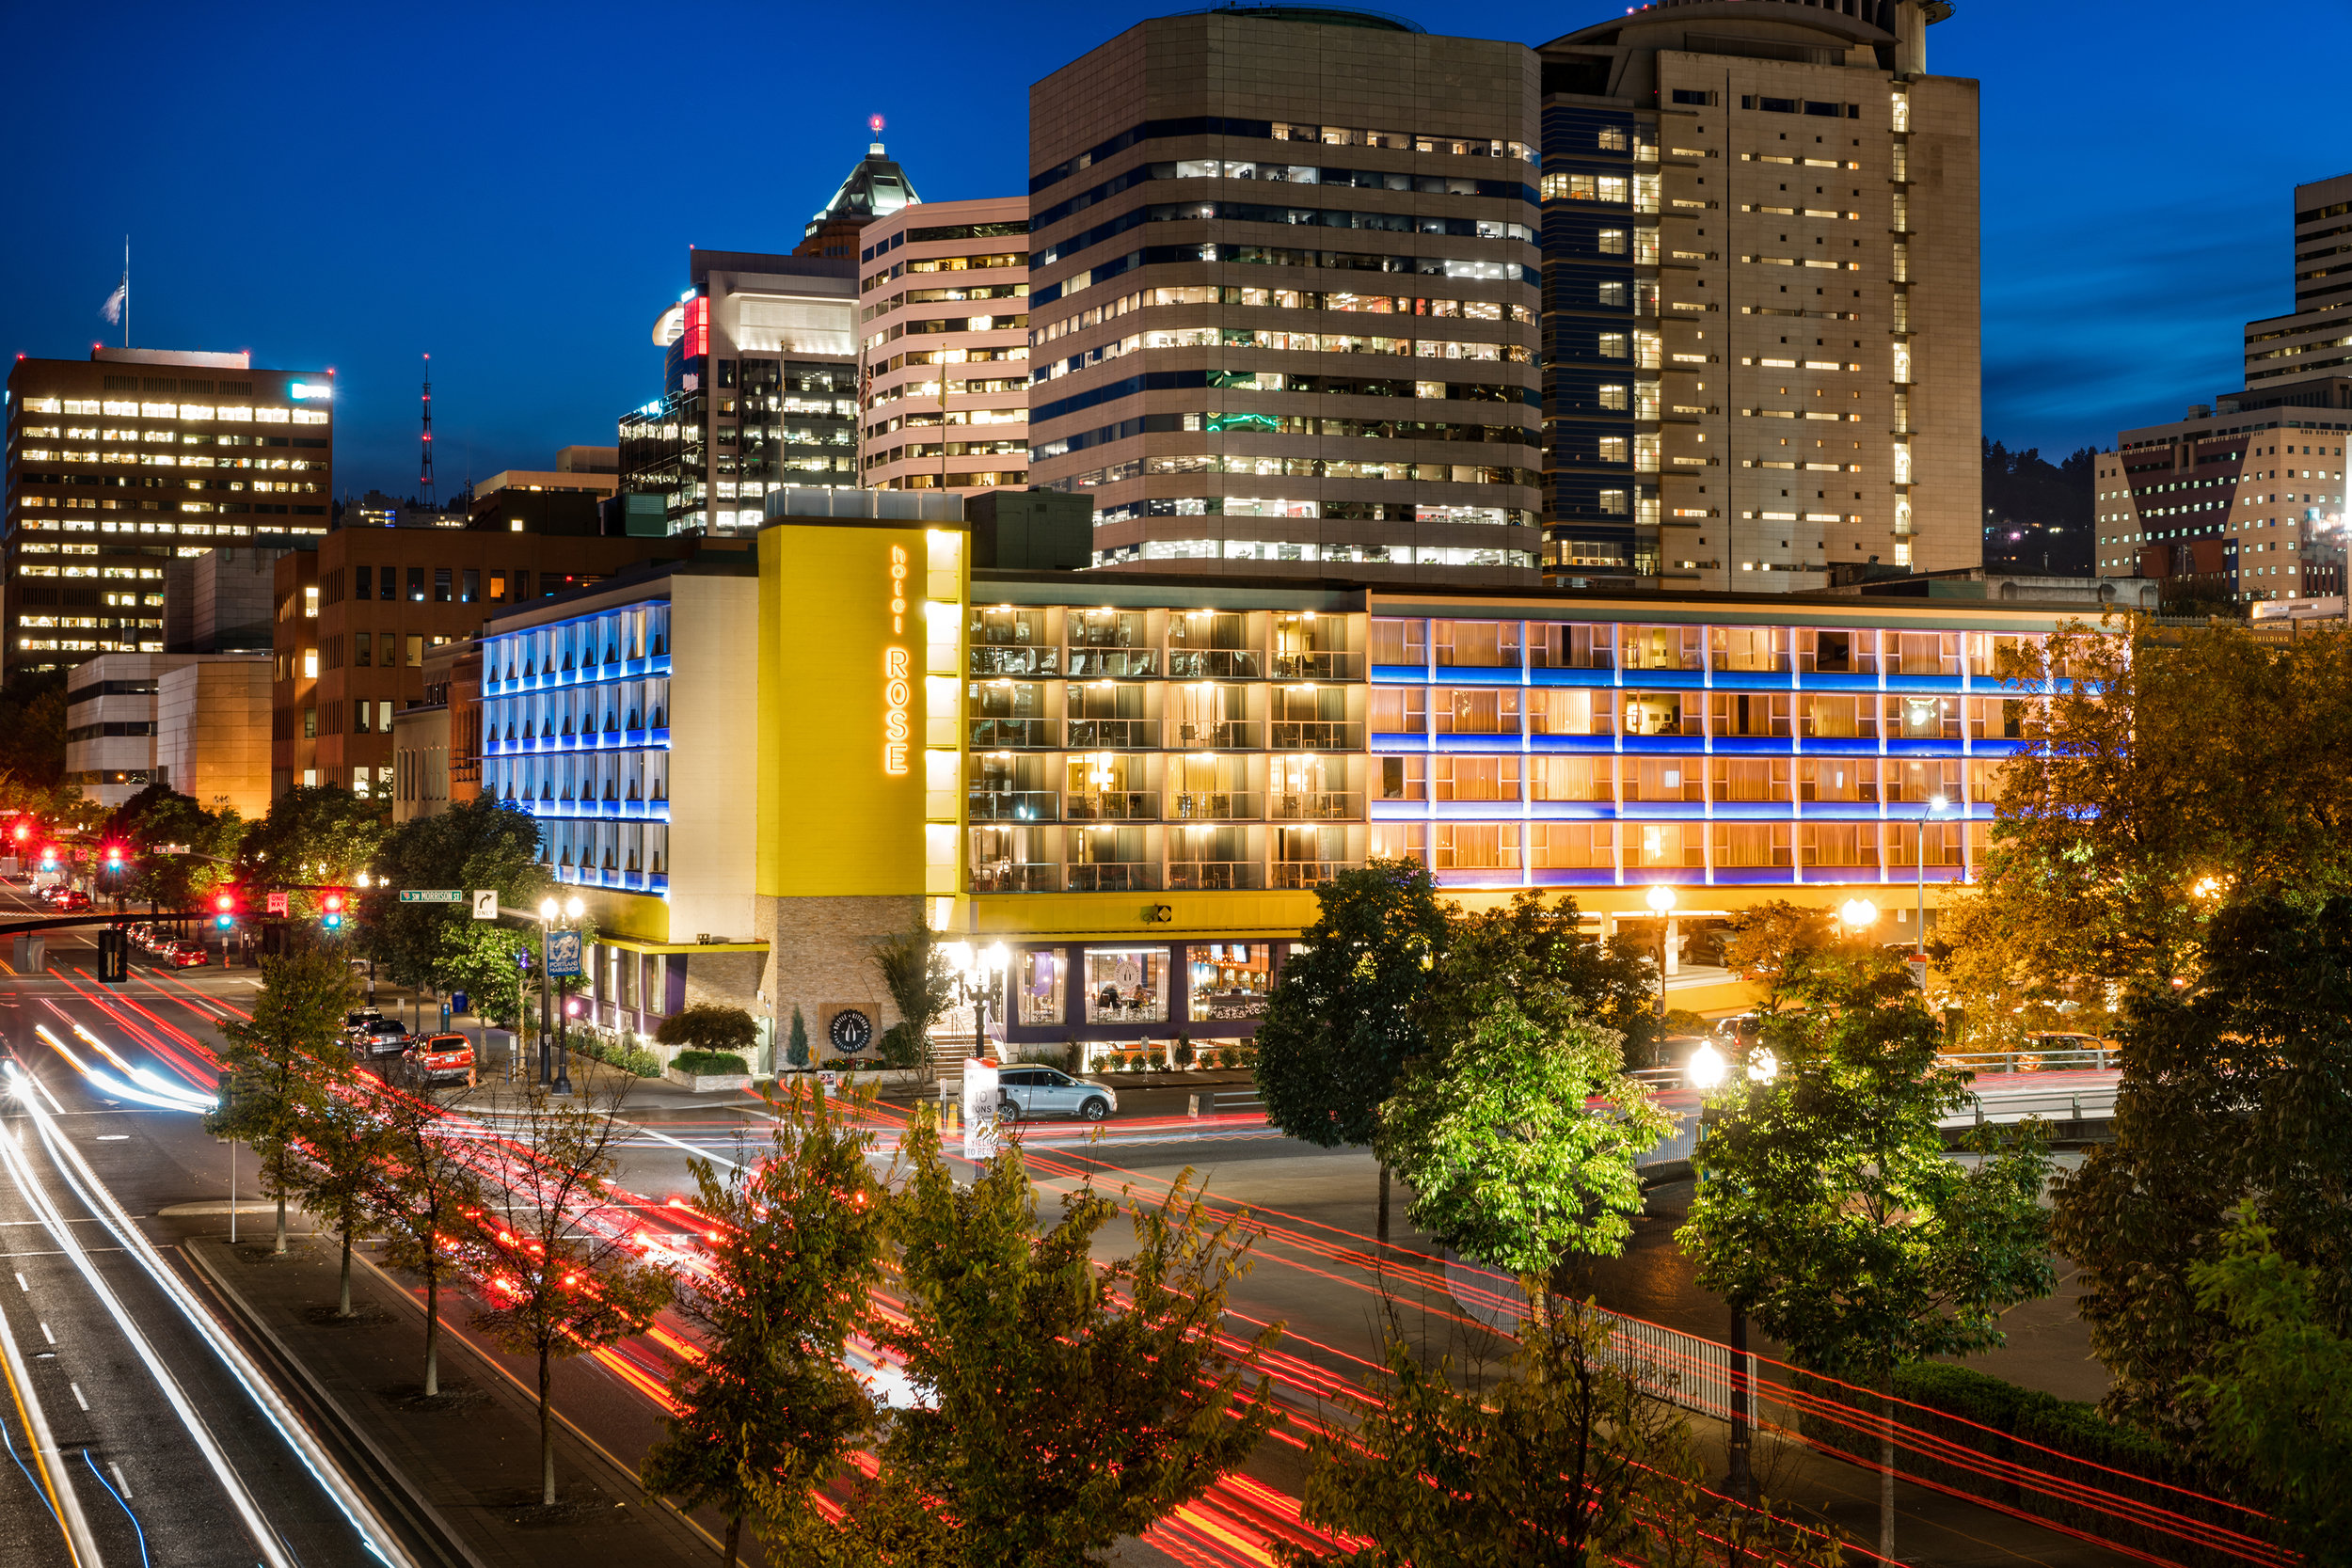 Hotel Rose-Exteriors-Hotel Front Evening.jpg